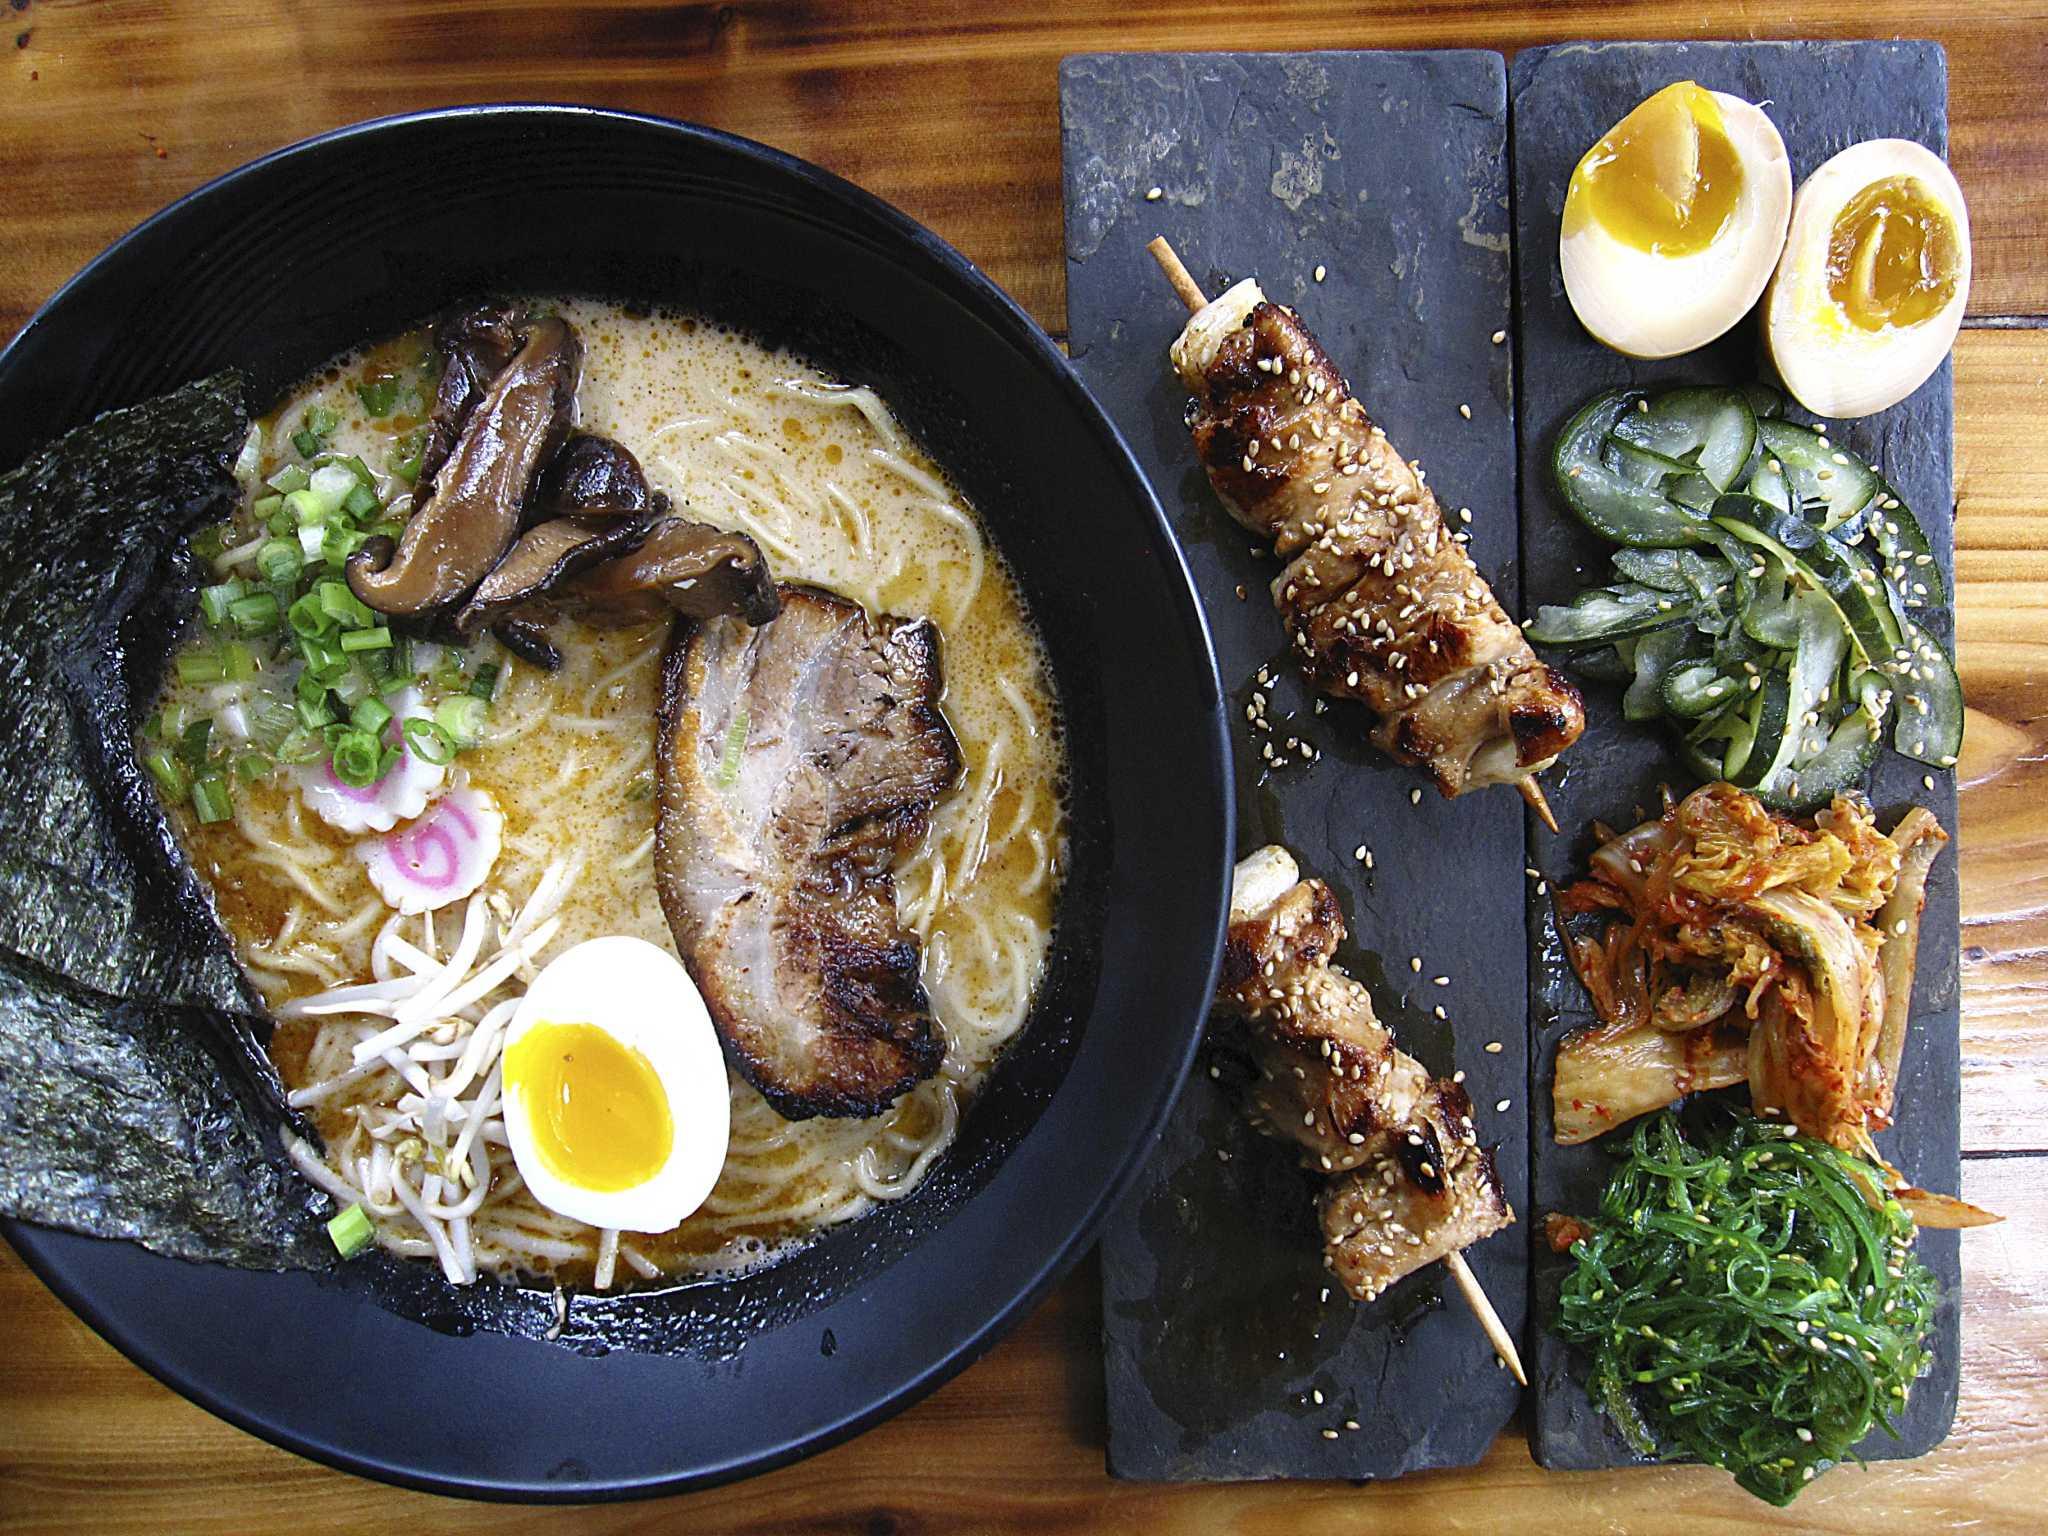 Ramen restaurant Kimura at Freight closes in San Antonio's Lone Star District